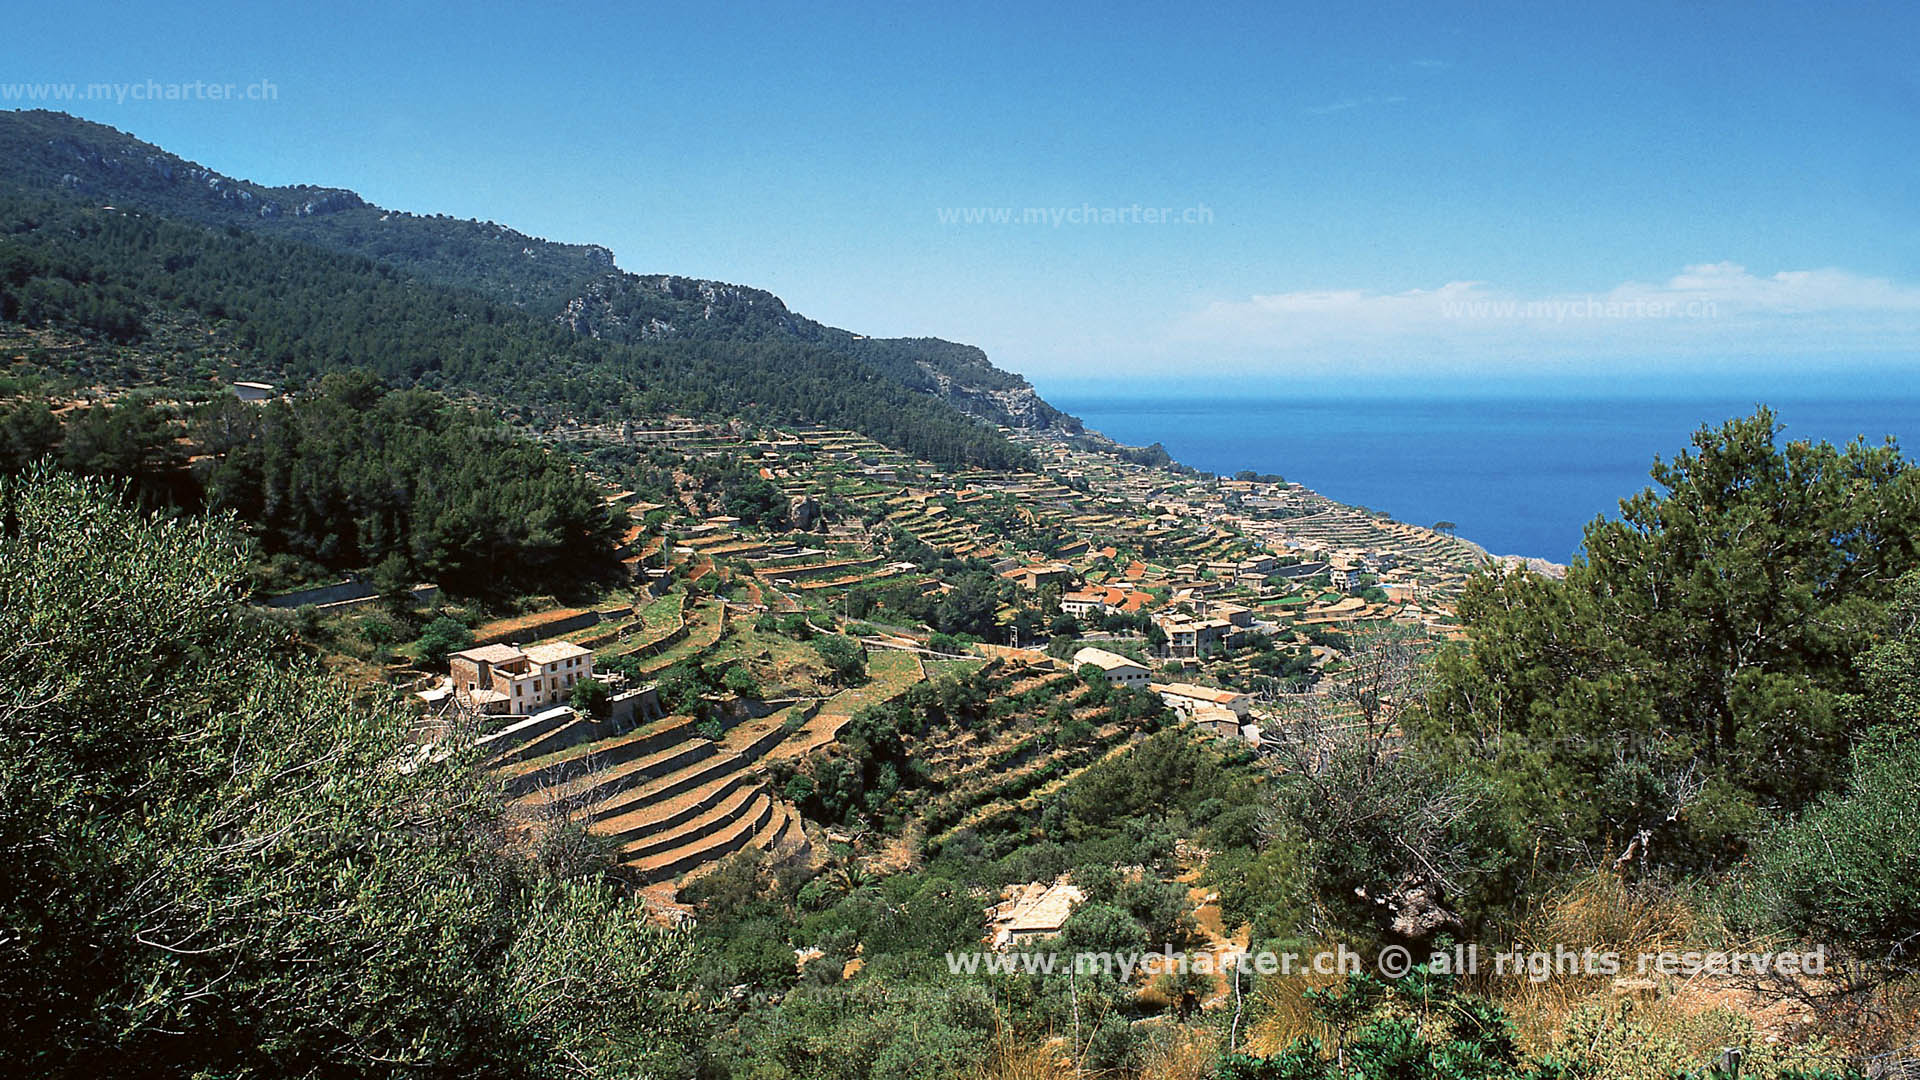 Mallorca - Banalbufar